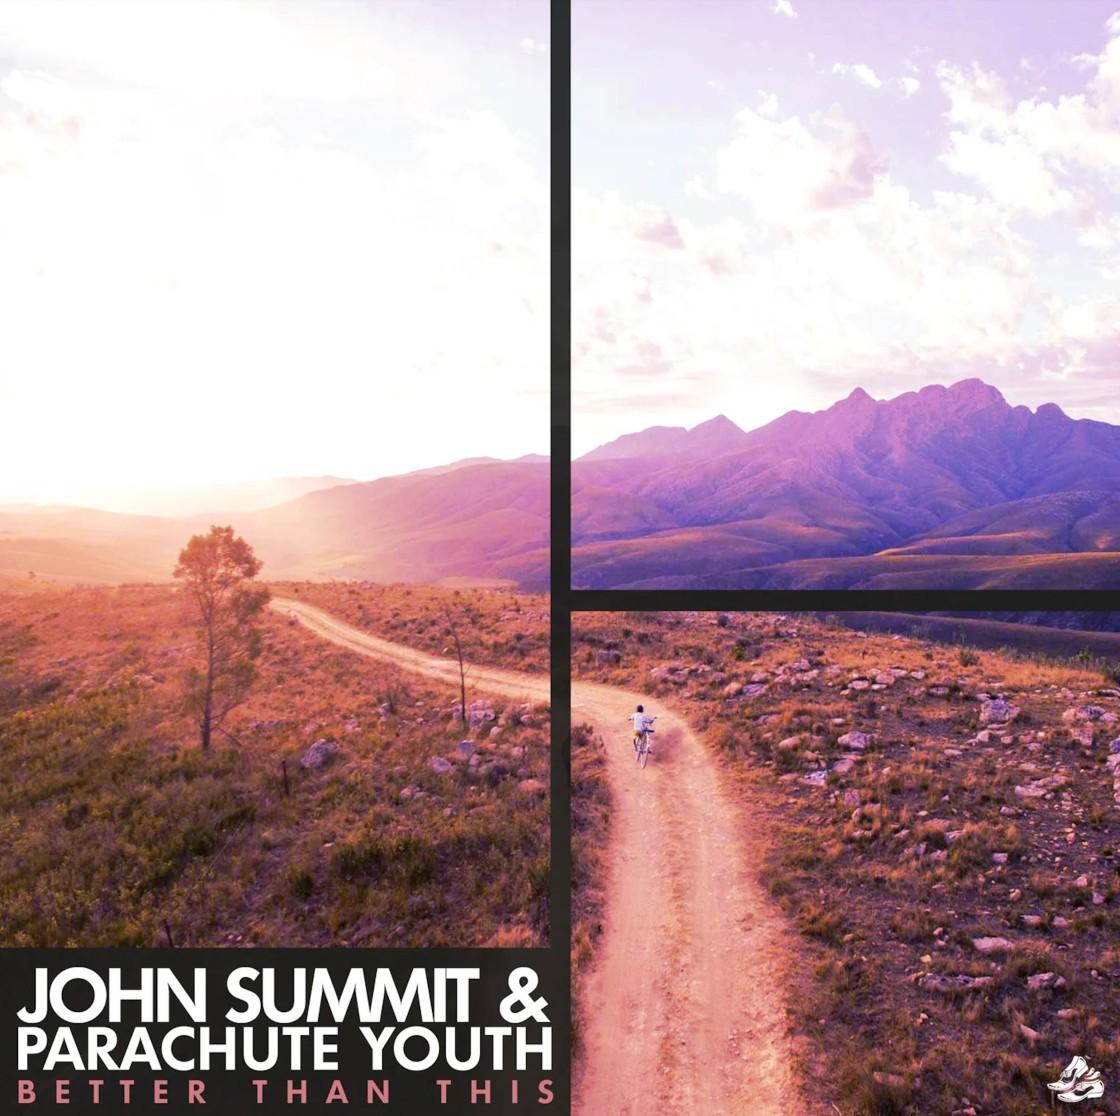 John Summit & Parachute Youth - Better Than This